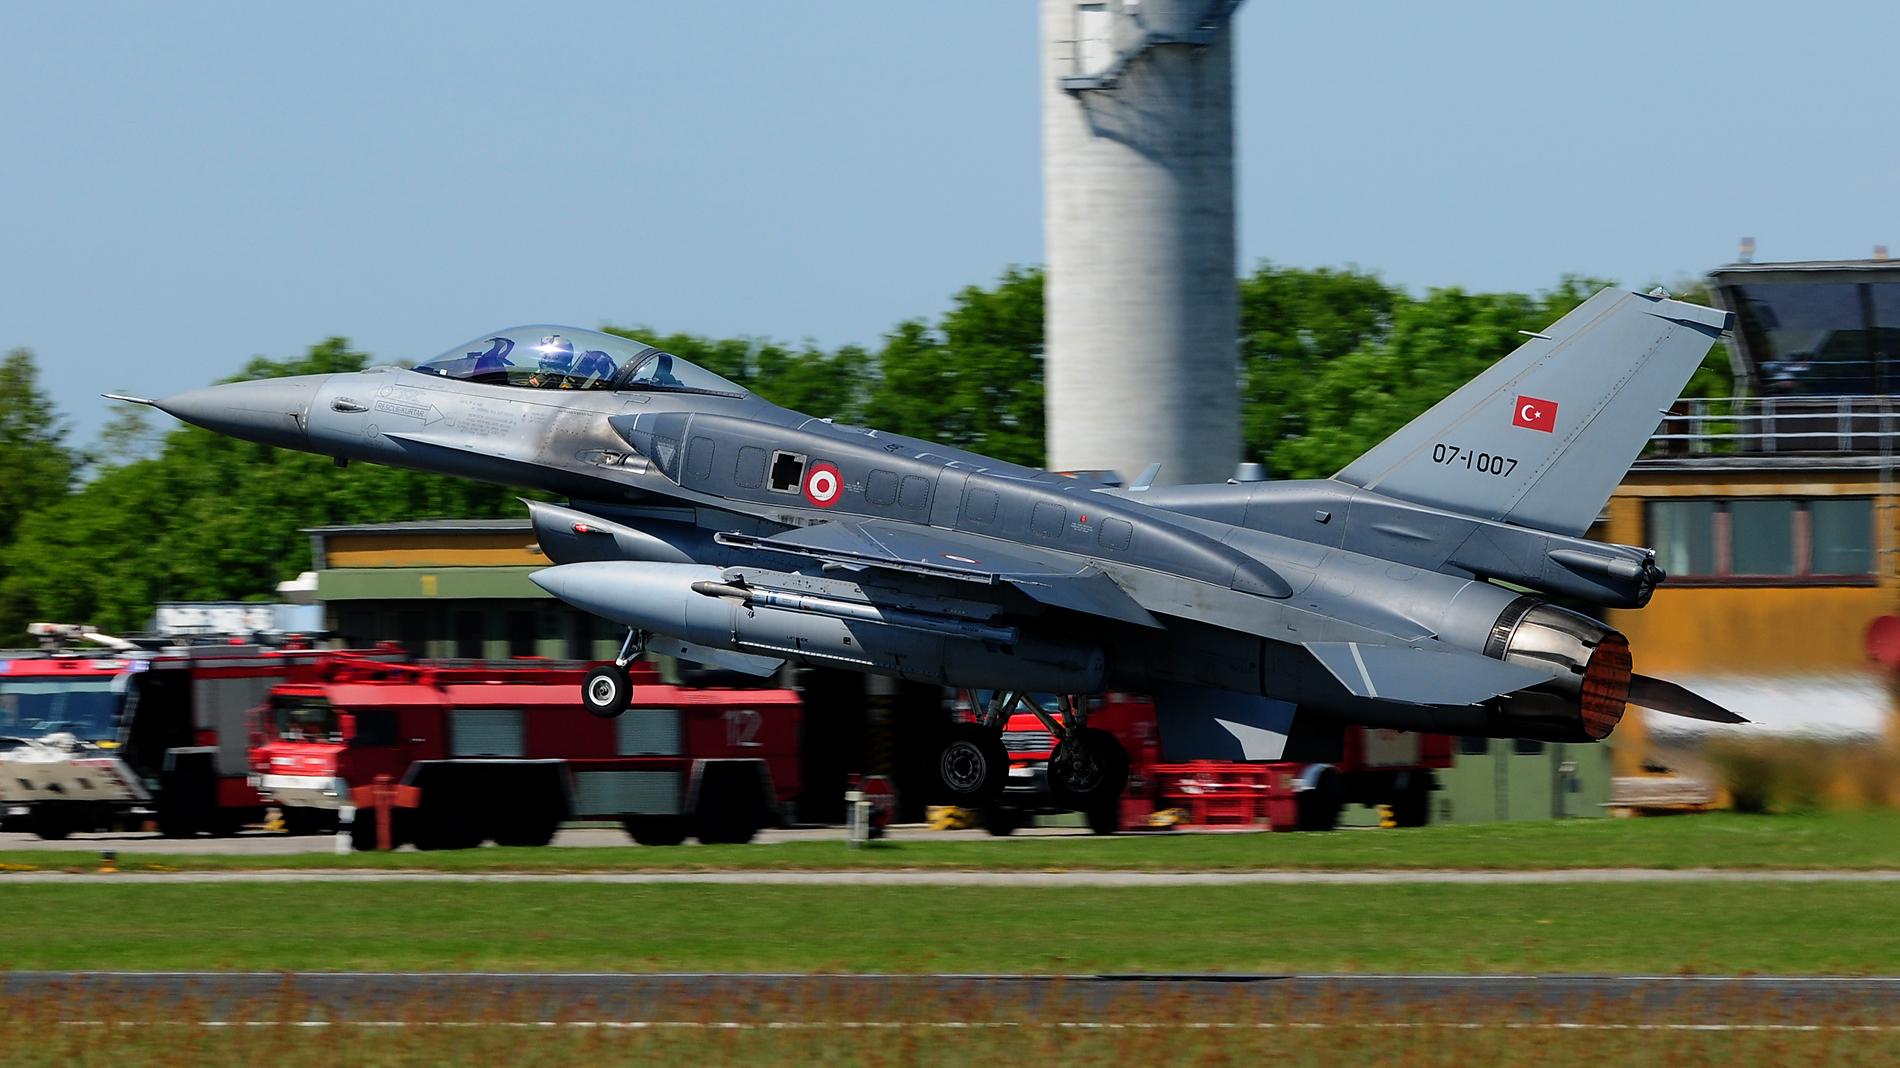 Turkish Air Force 07-1007